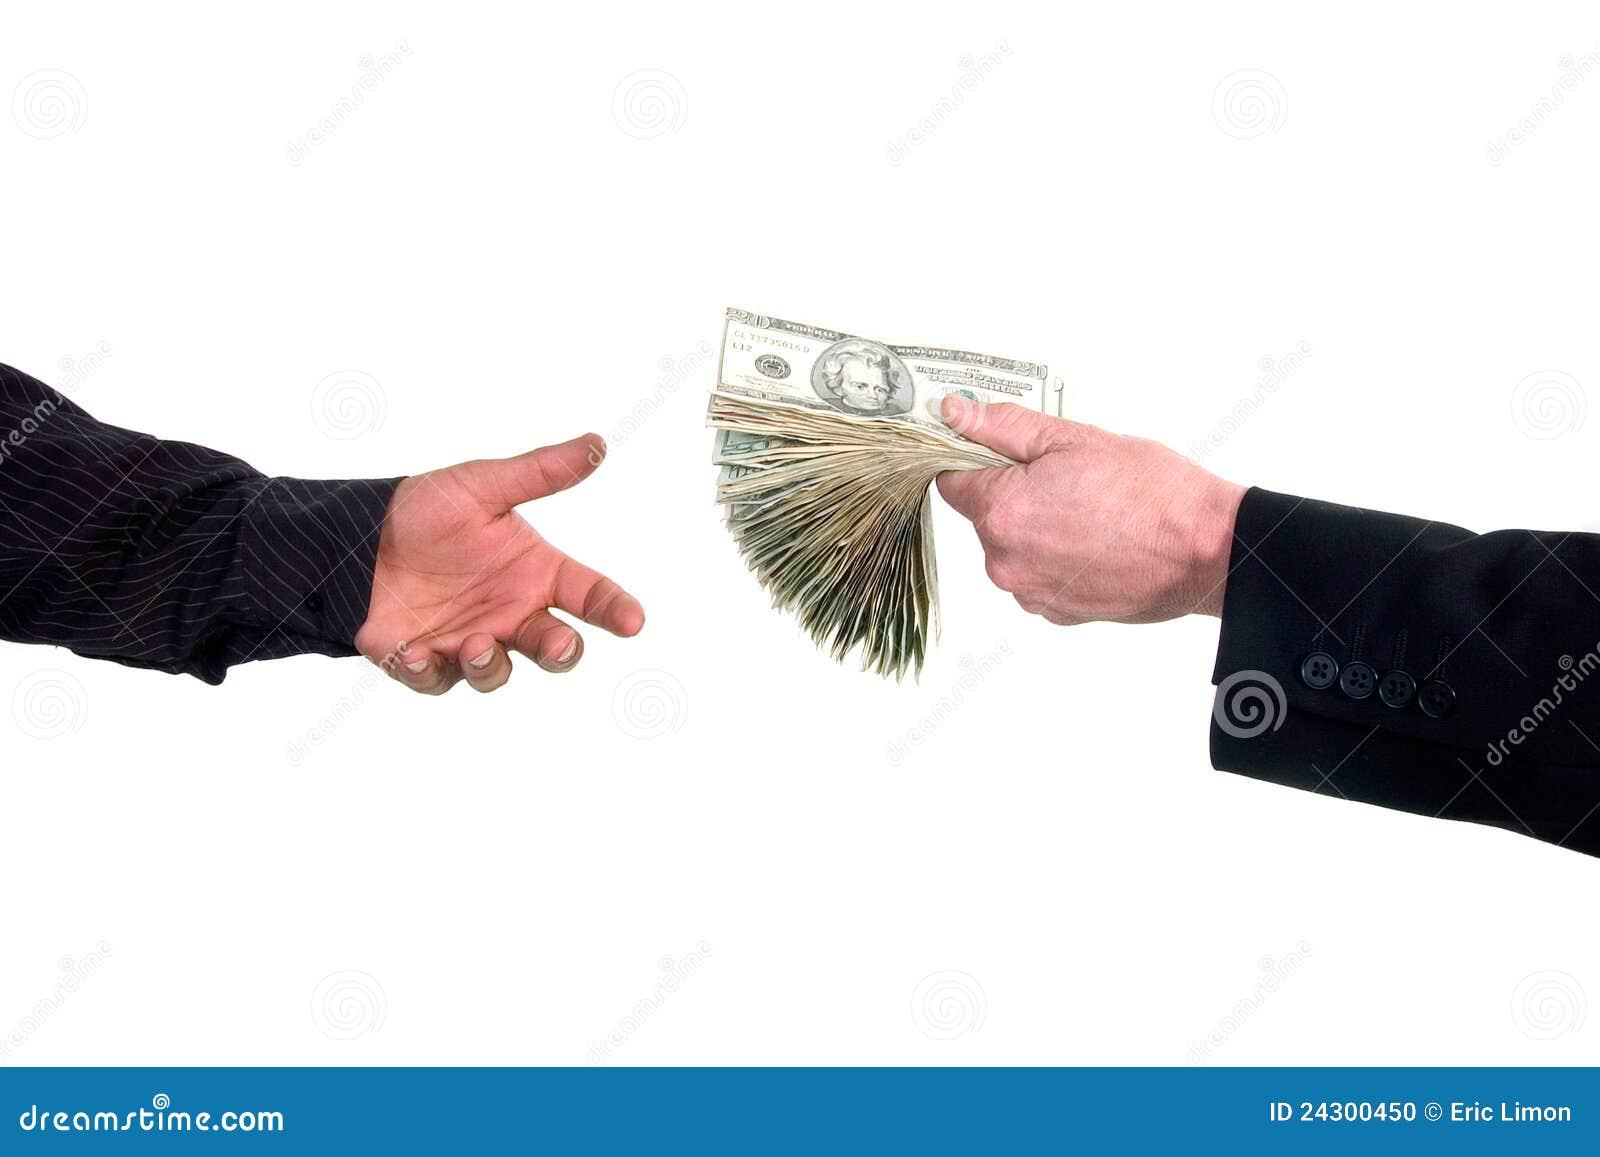 Fast cash loans in kenya picture 3